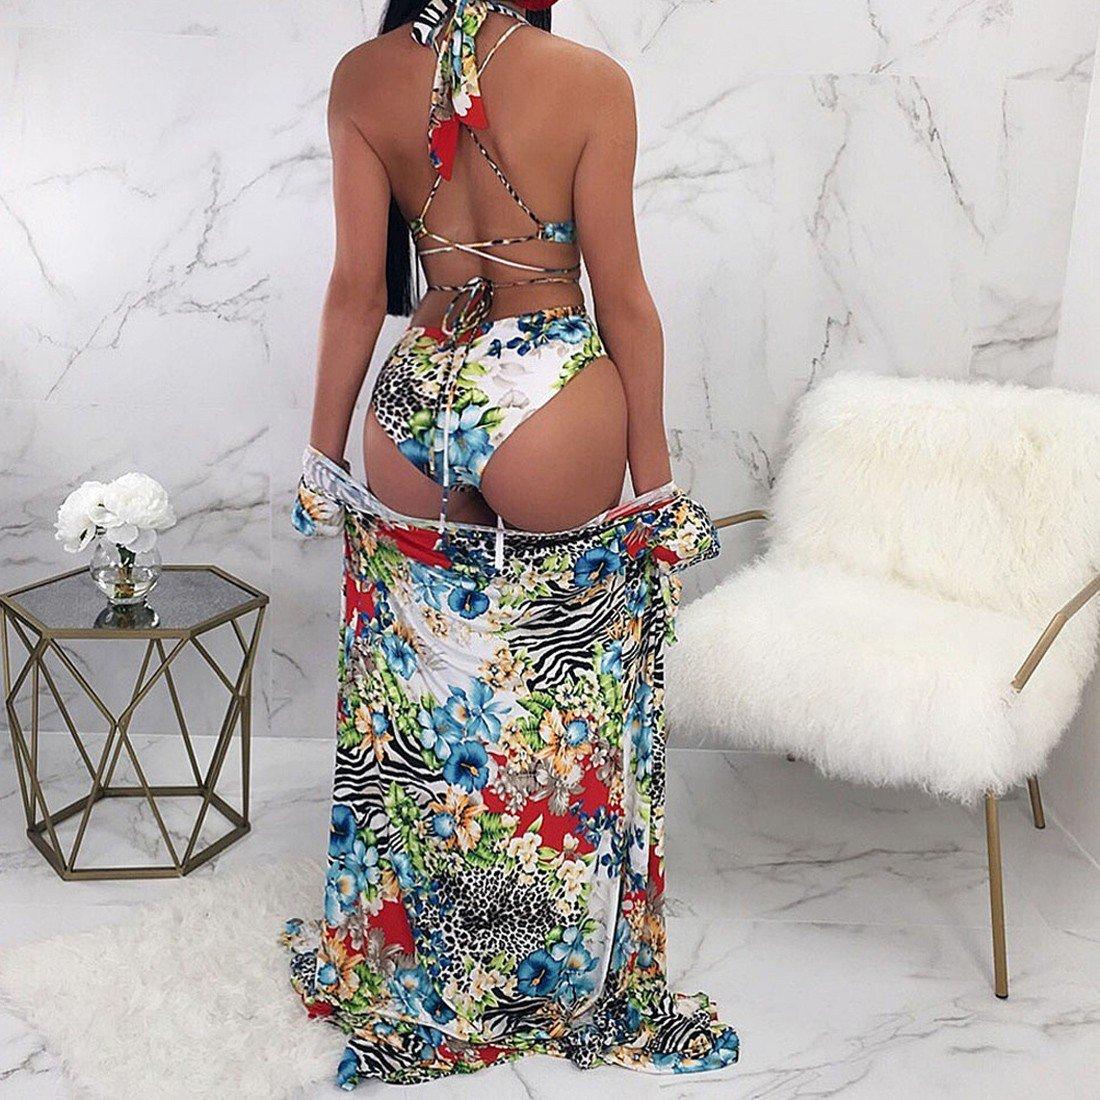 d7a322b771e Amazon.com  Paixpays Women s Two Pieces Sexy Flower Print Bikini Swimsuit+Cover  up Long Dress  Clothing